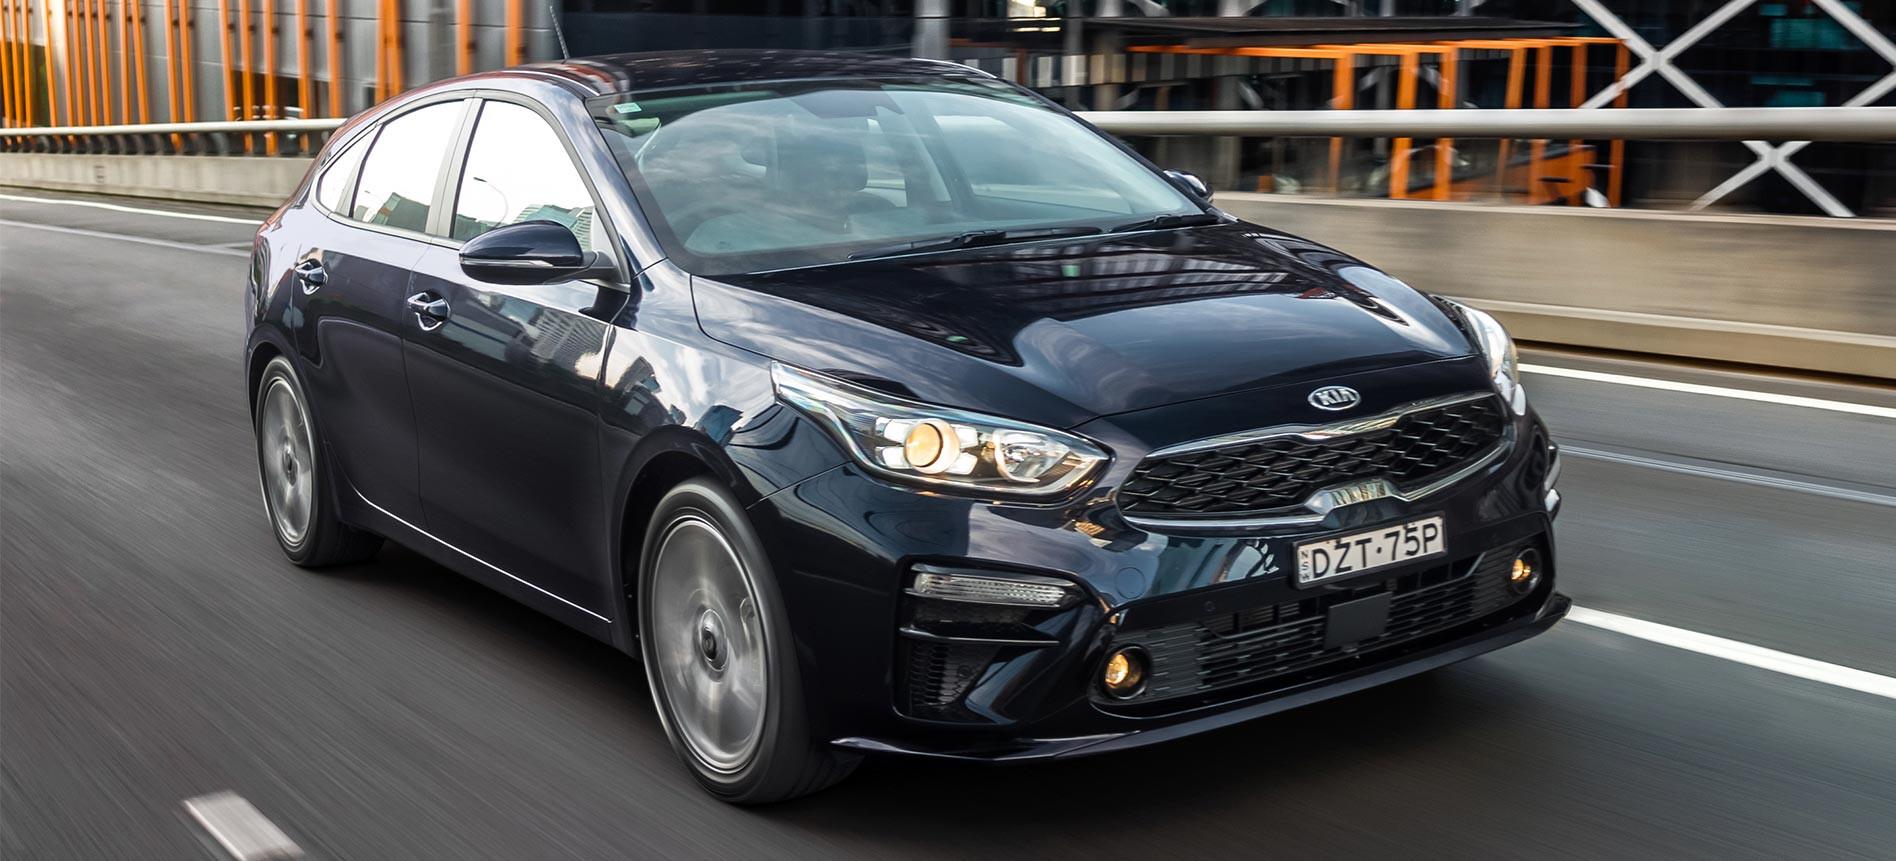 2019 Kia Cerato Sport Hatch quick review feature